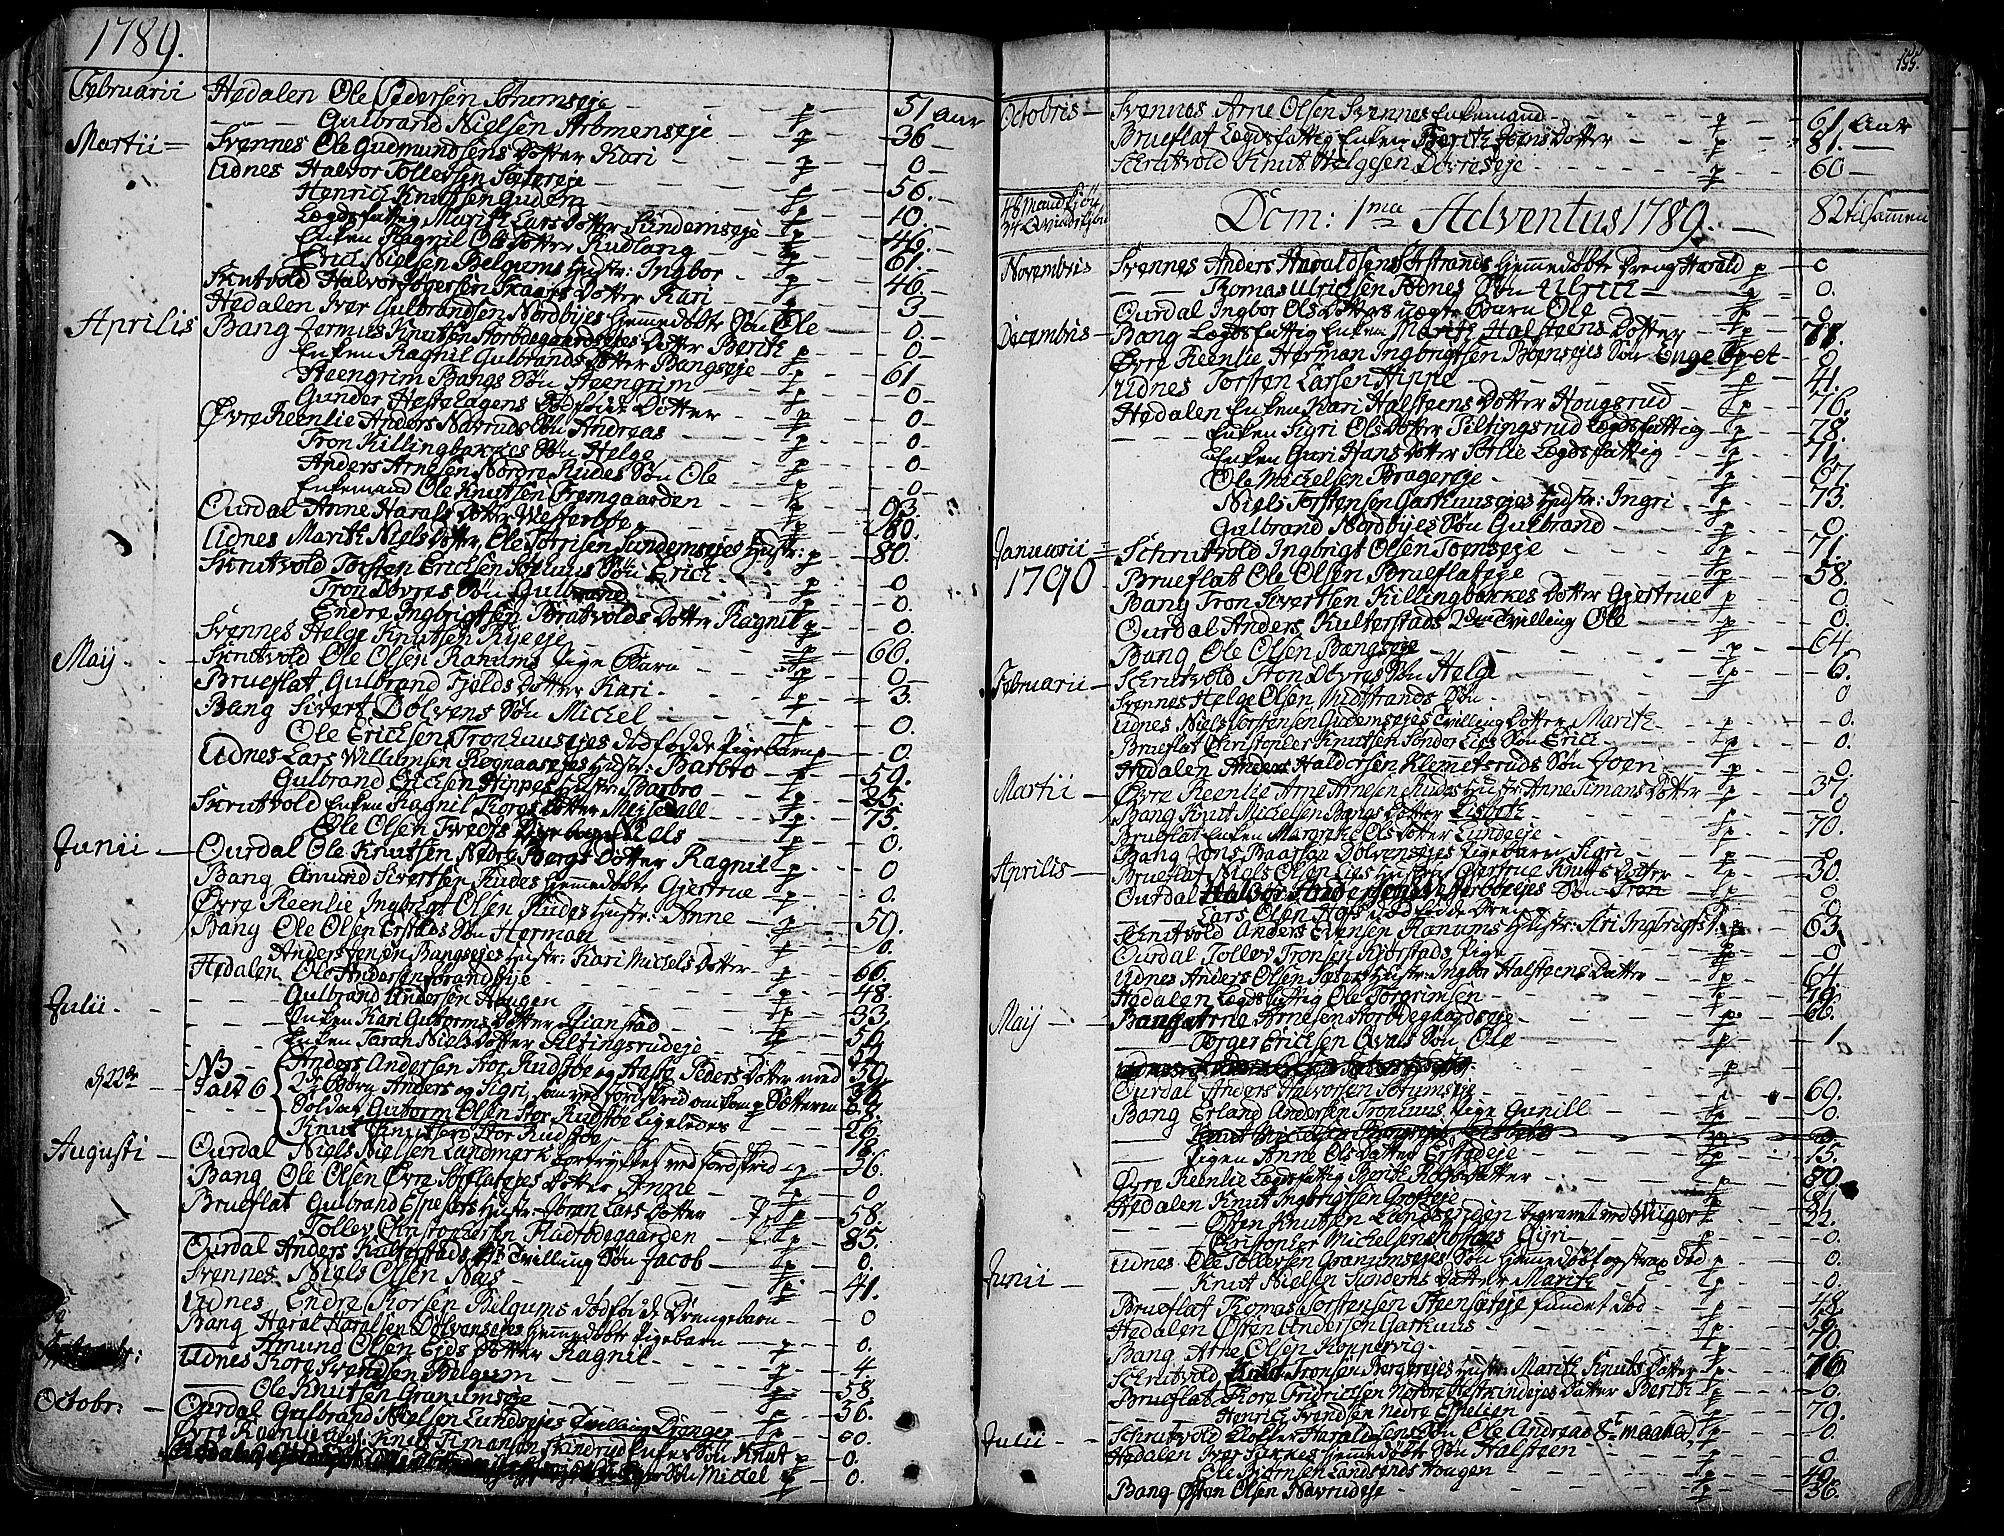 SAH, Aurdal prestekontor, Ministerialbok nr. 6, 1781-1804, s. 155